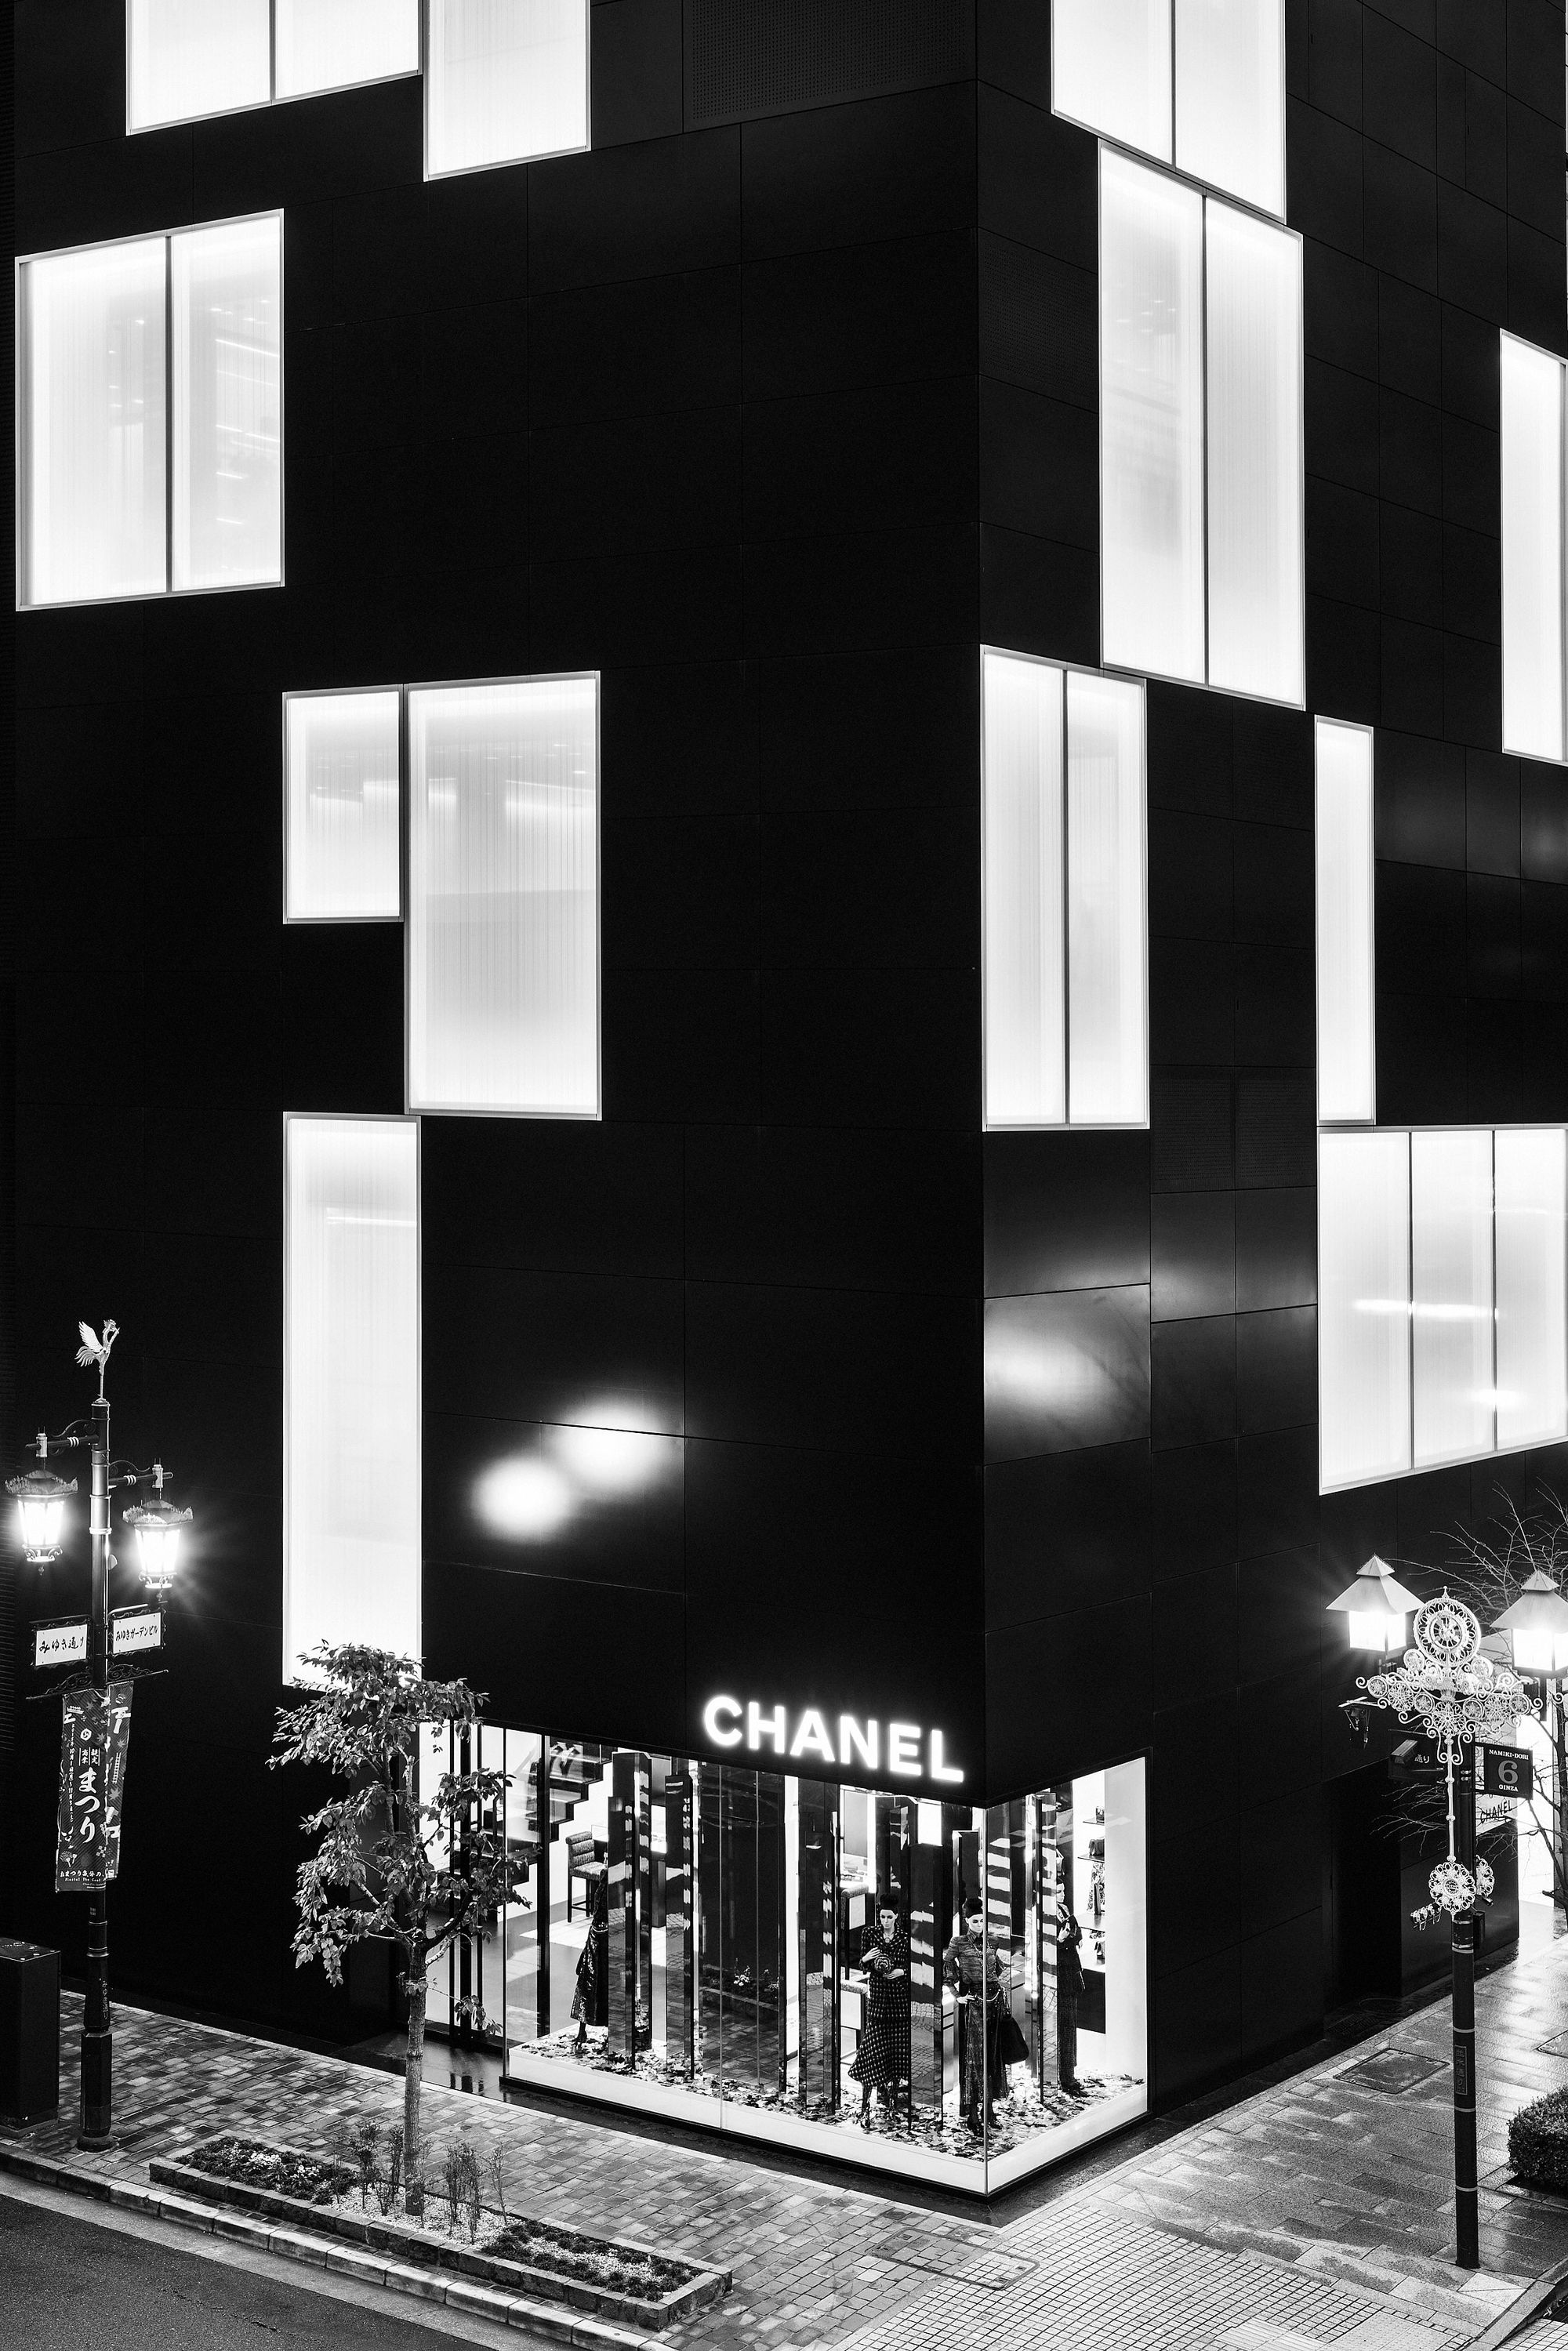 Chanel Namiki Ginza, Manolo Yllera